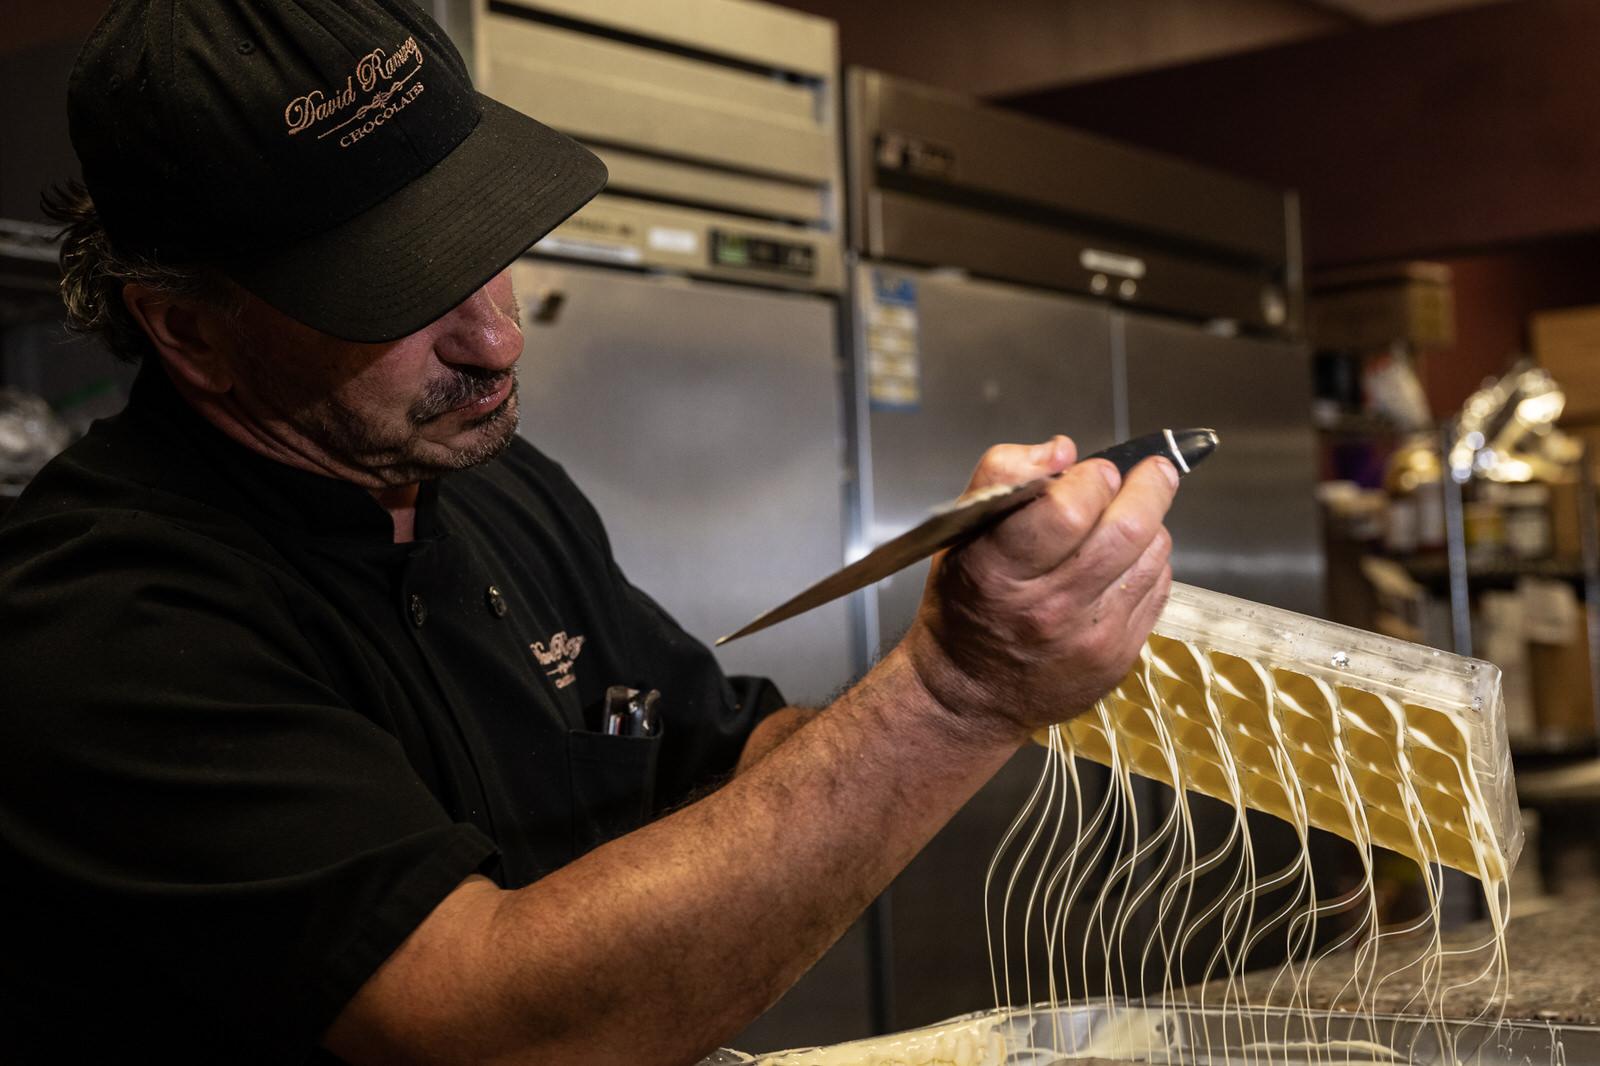 David Ramirez lines the chocolate molds with white chocolate